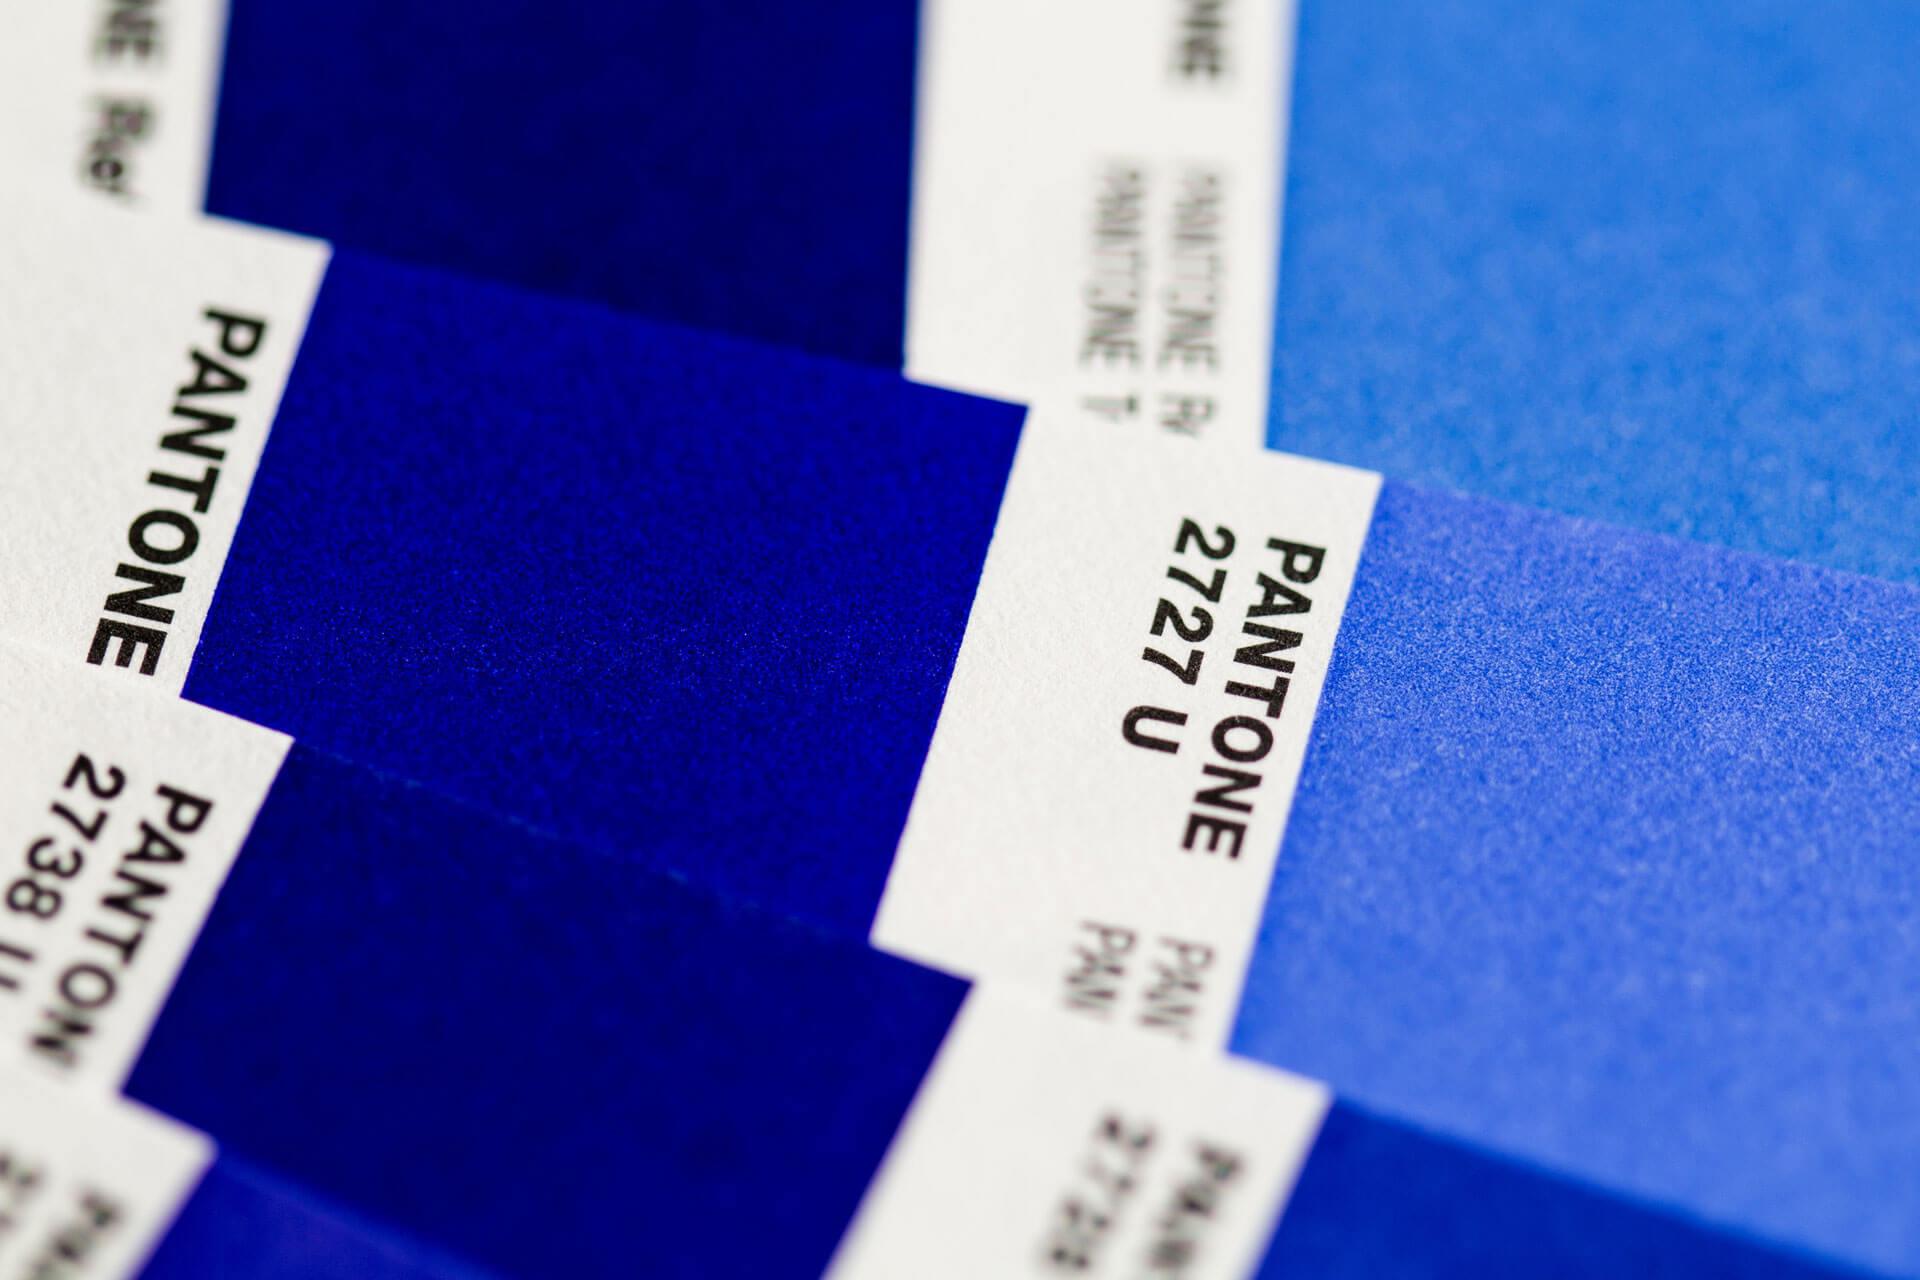 Pantone Cobalt Blue